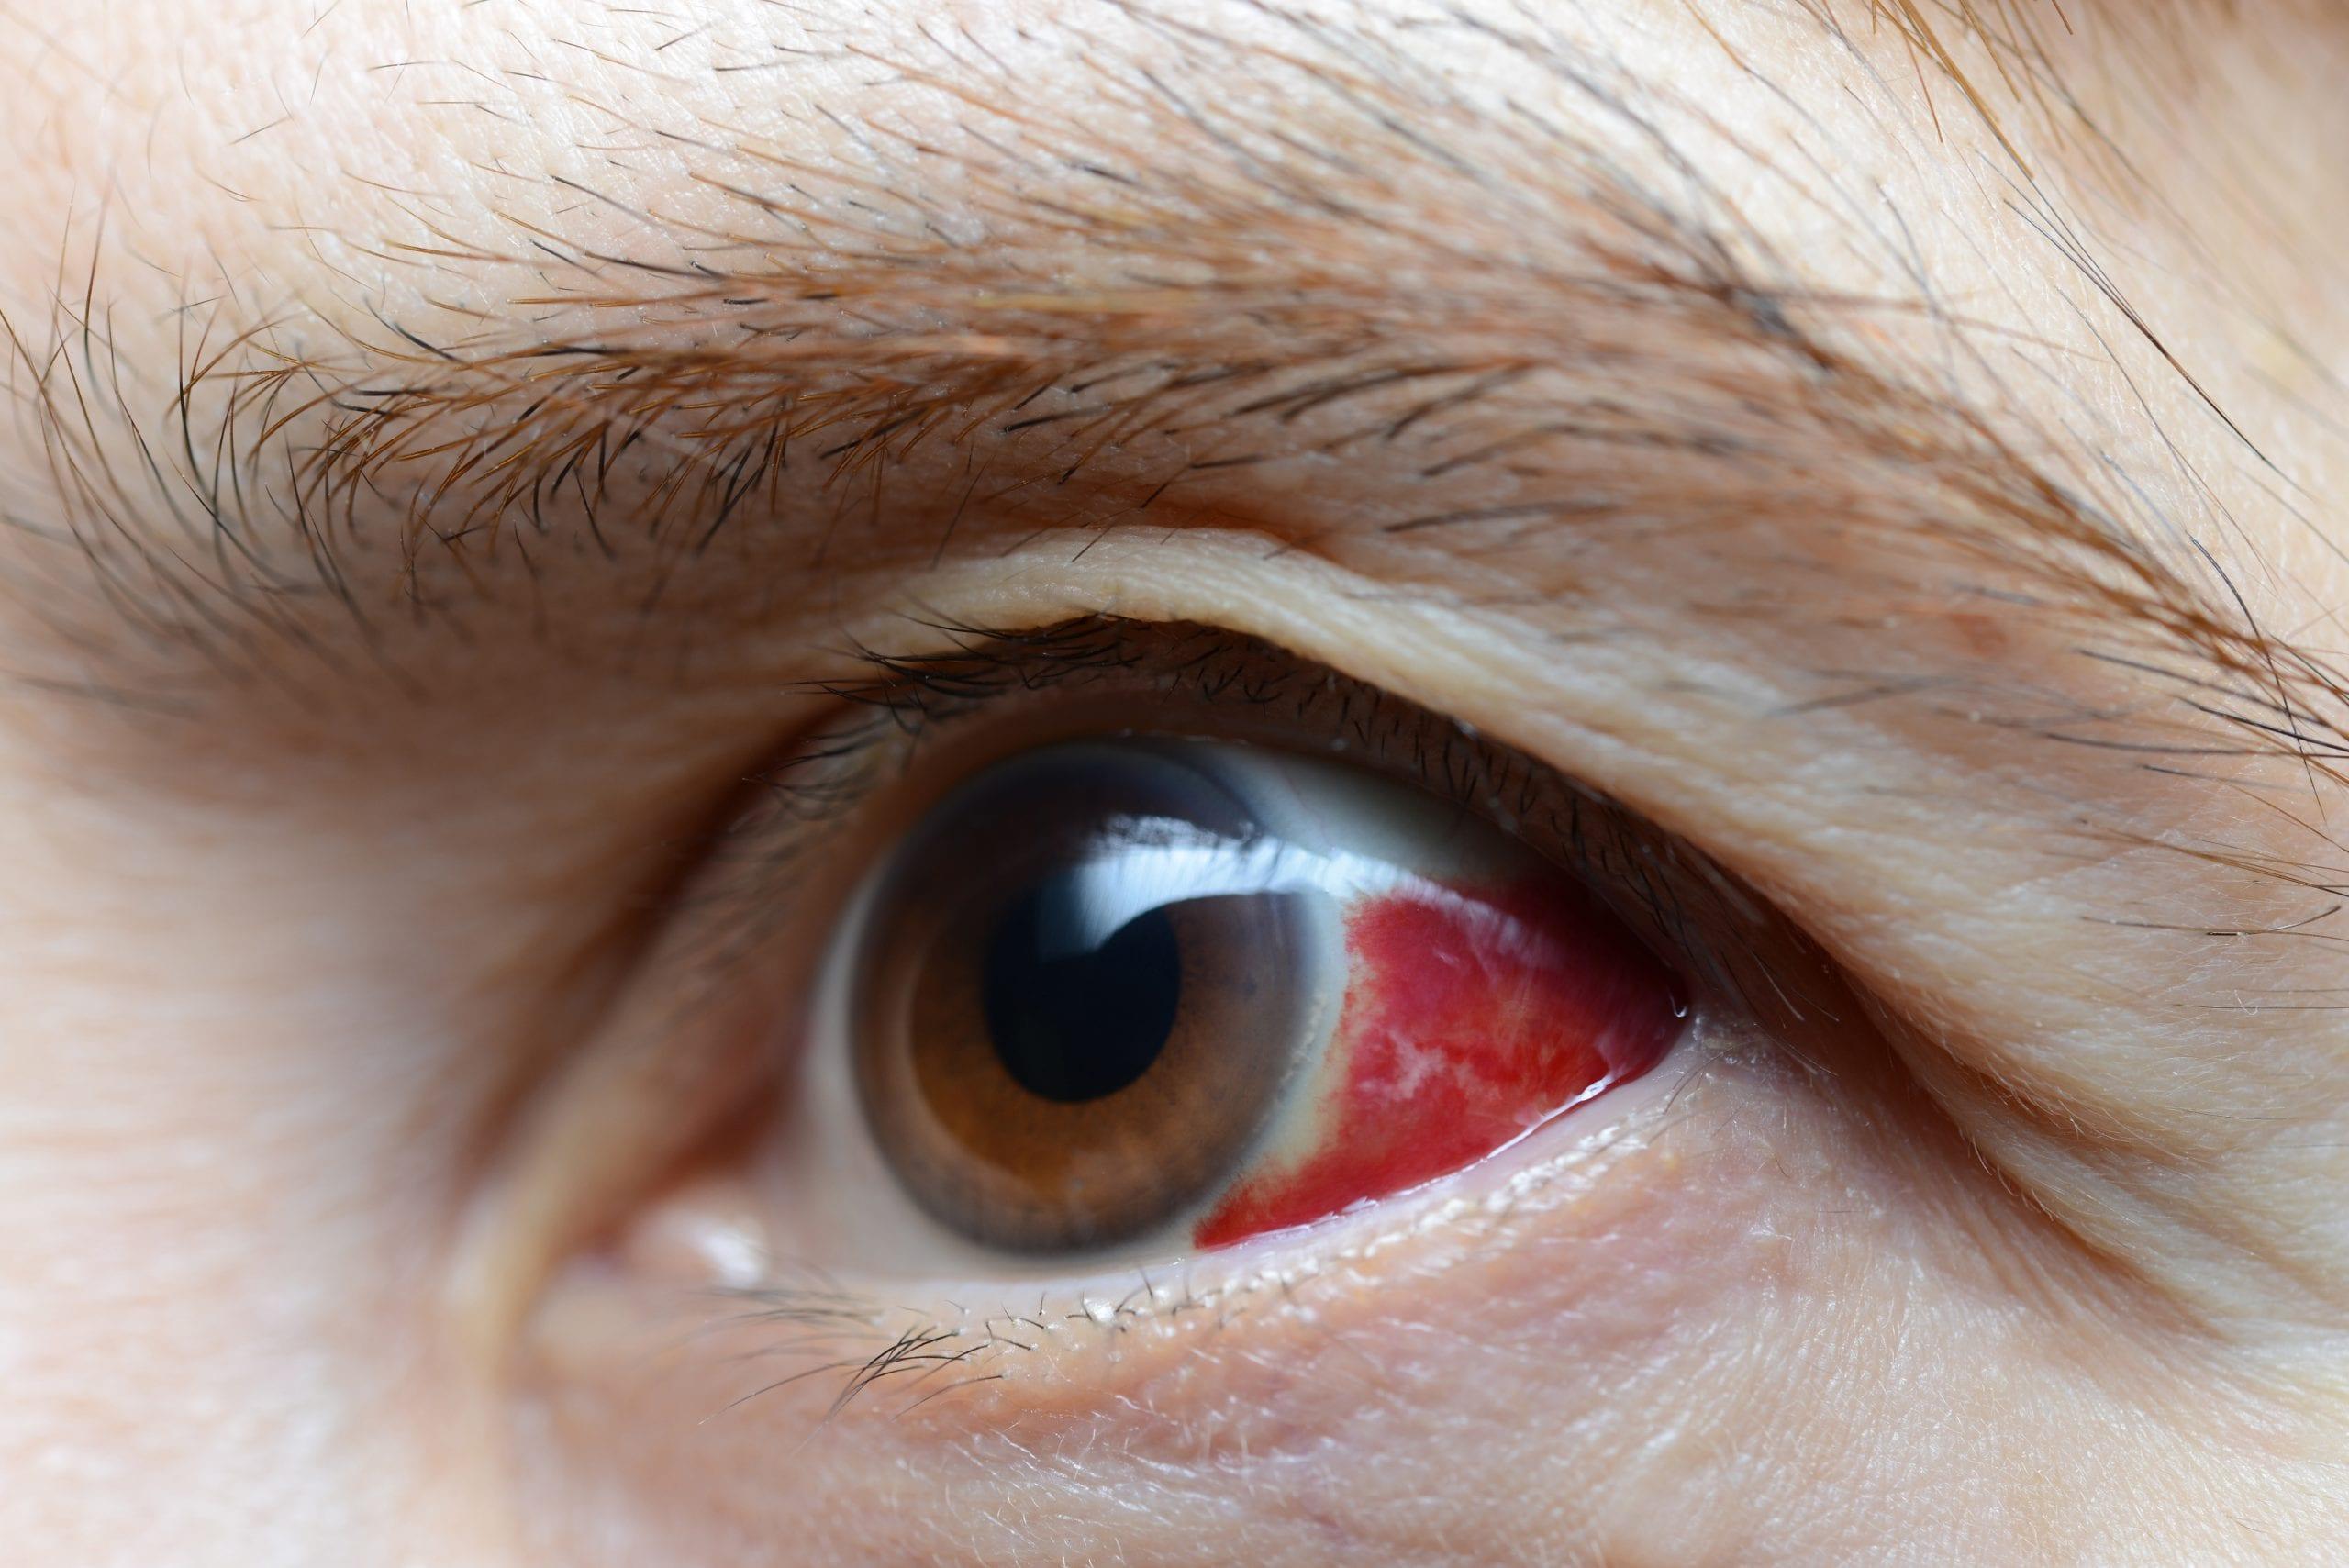 Woman with burst blood vessel in eye, closeup